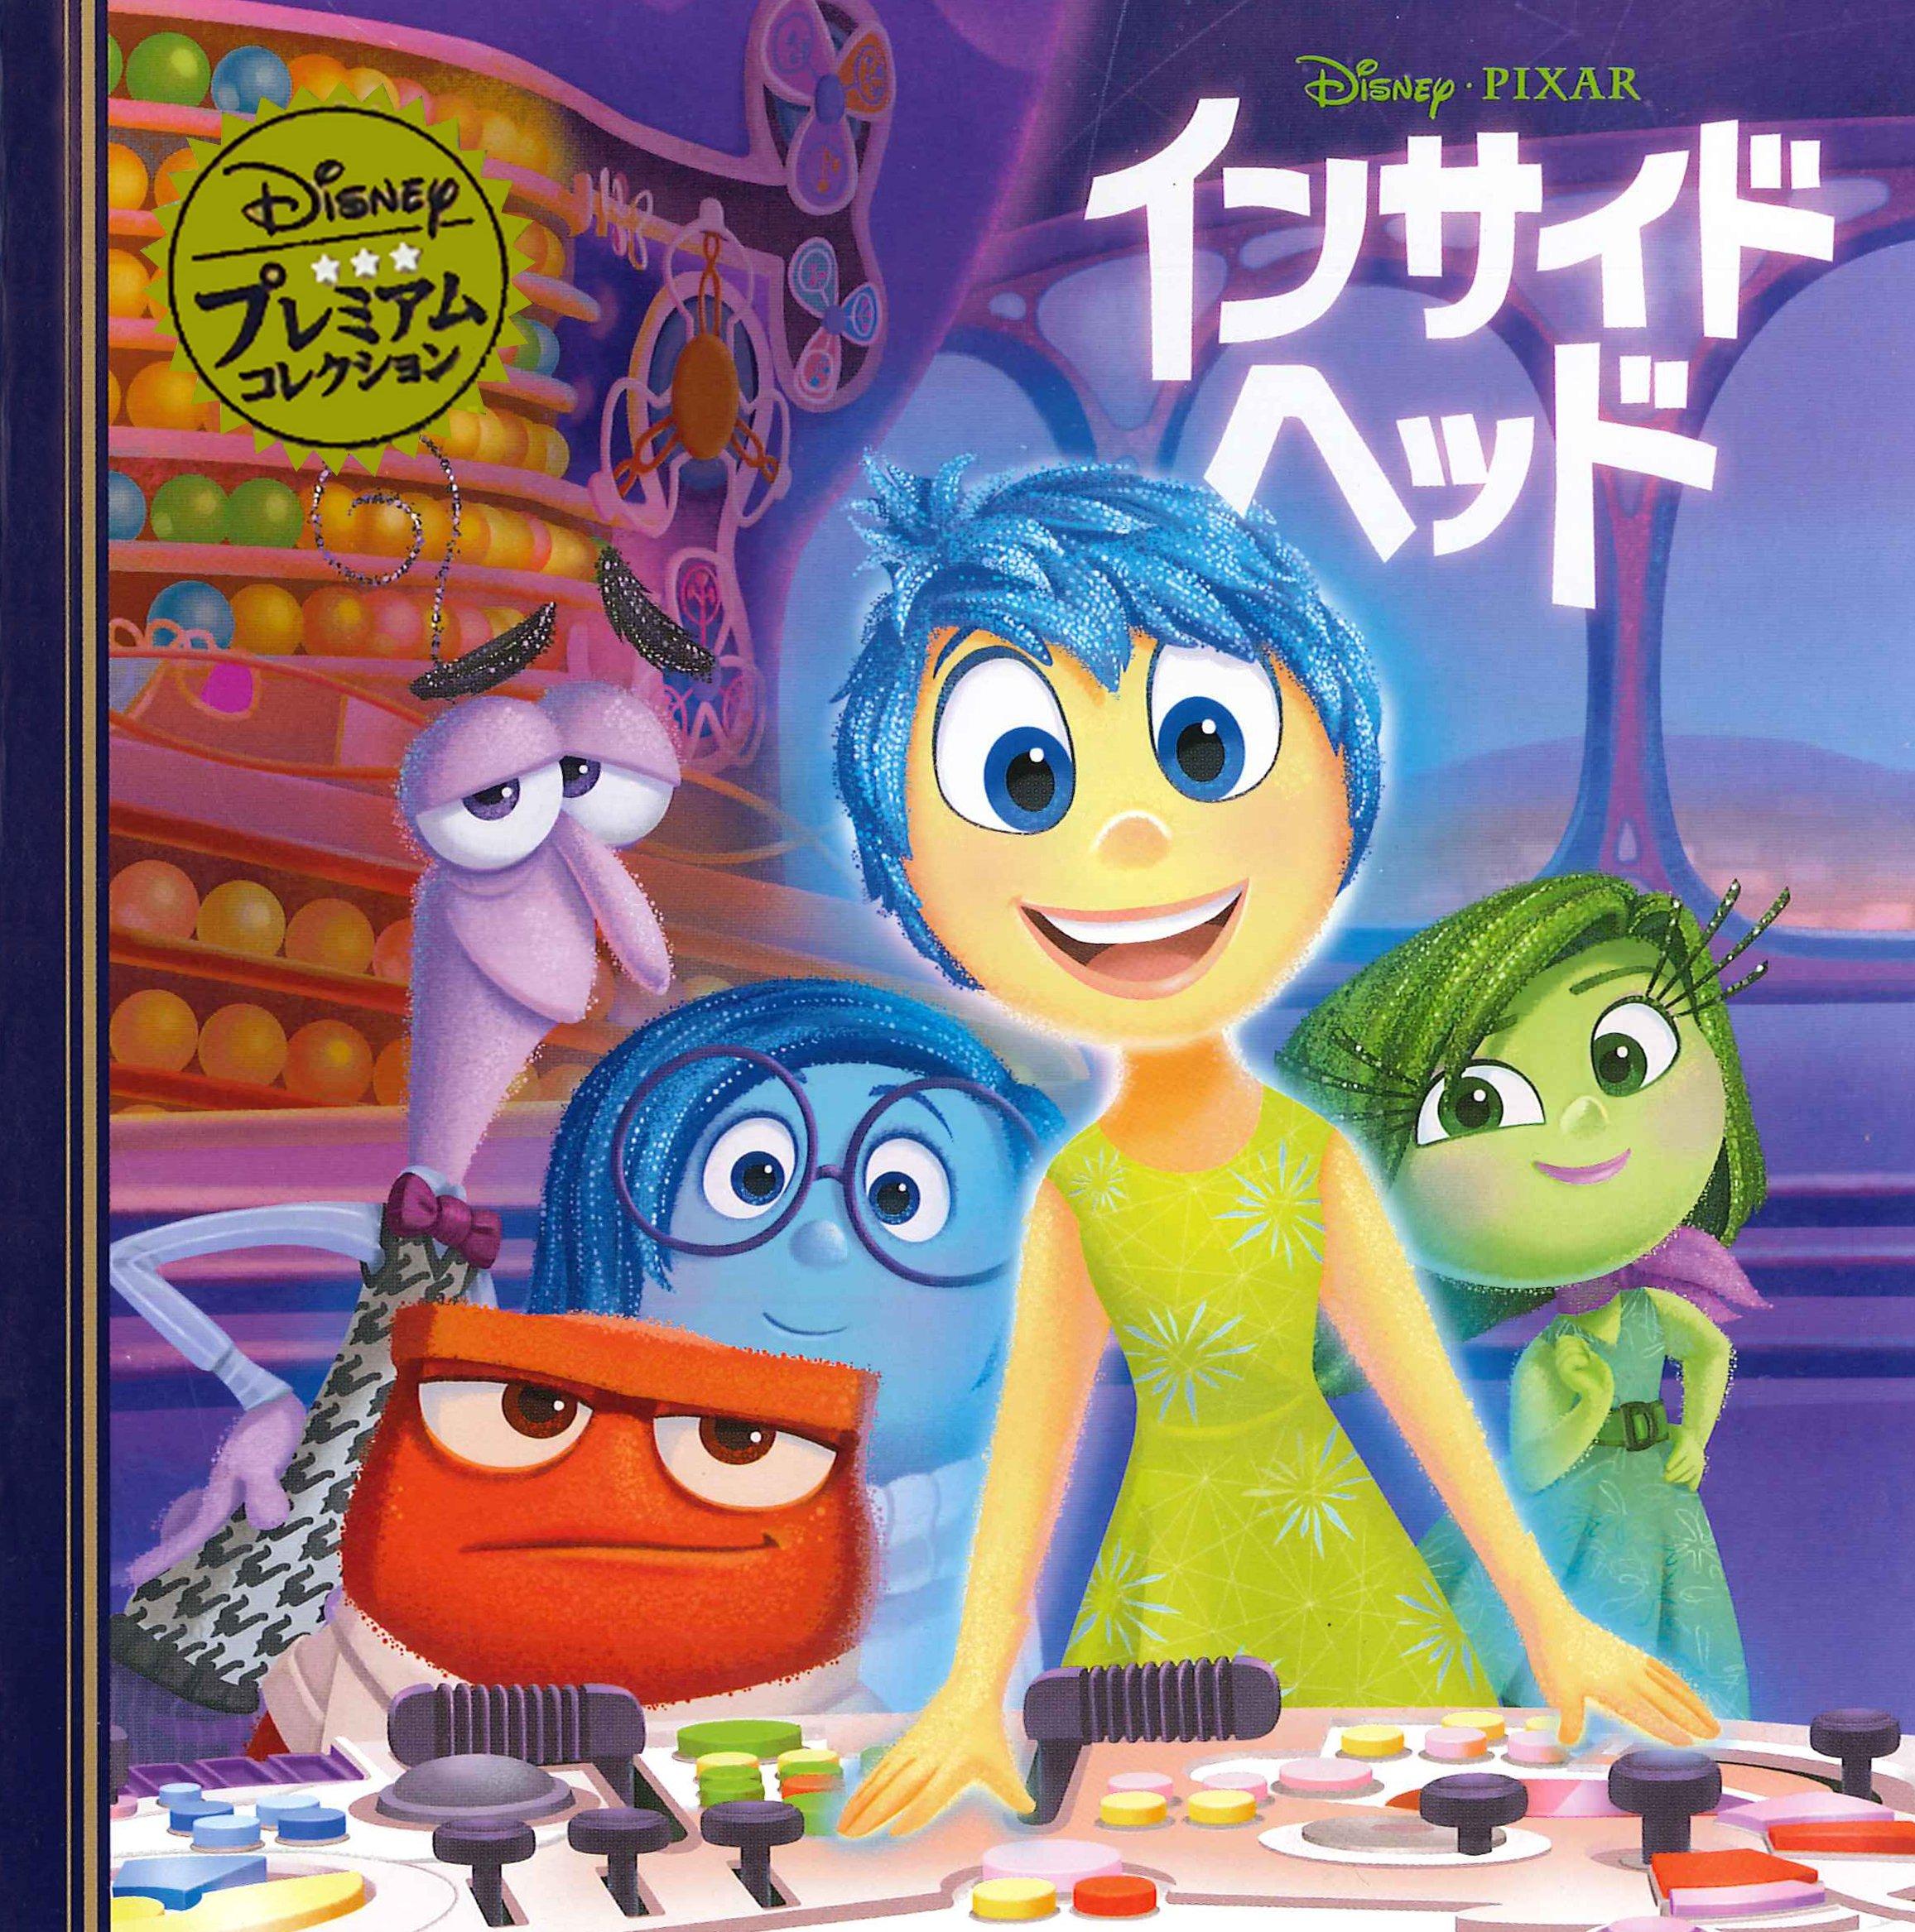 Ciatr for Inside 2007 dvd